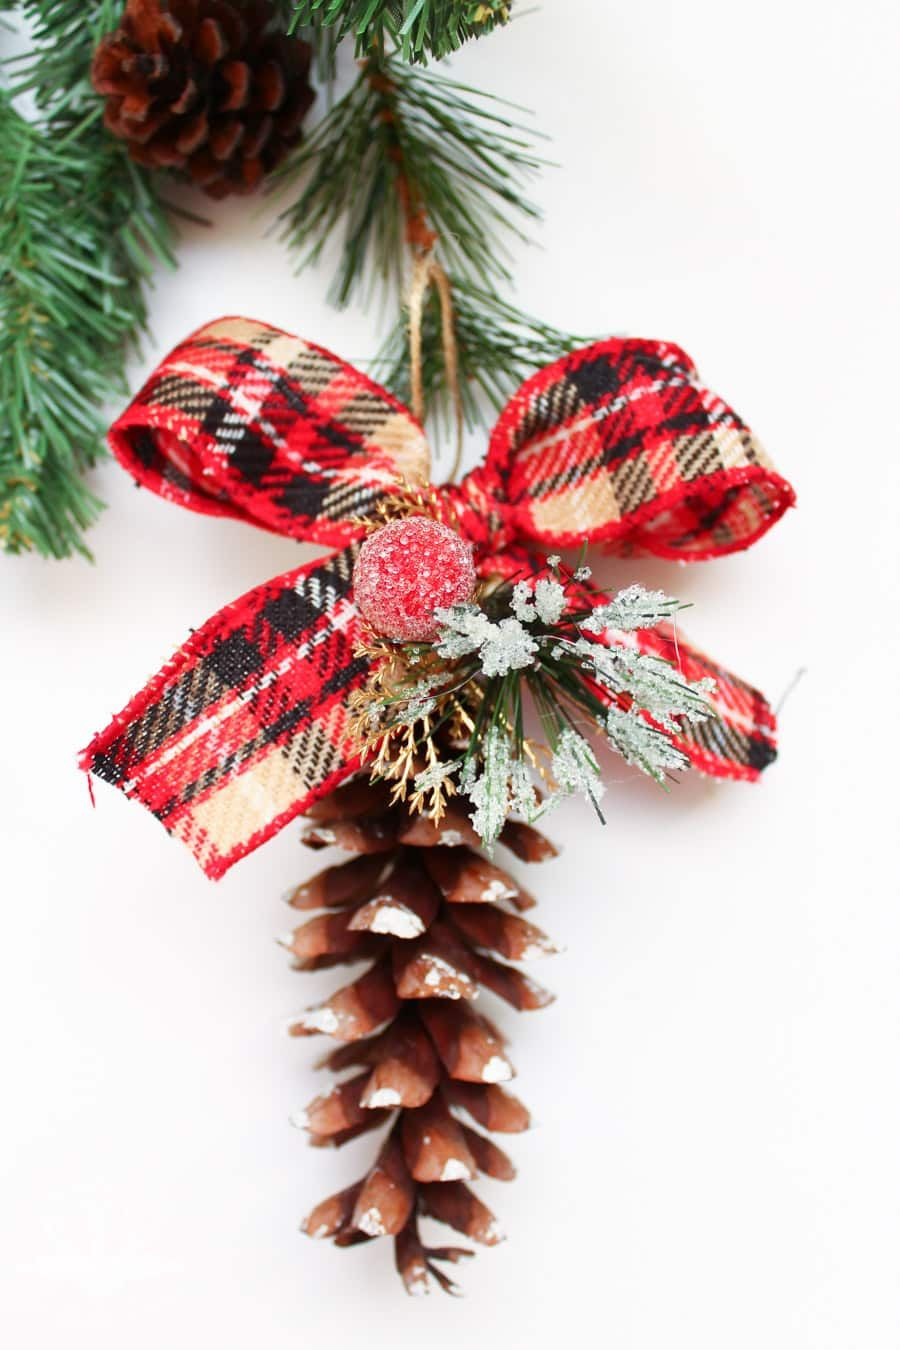 Diy Pine Cone Ornaments Pinecone Ornaments Handmade Christmas Ornaments Rustic Ornaments